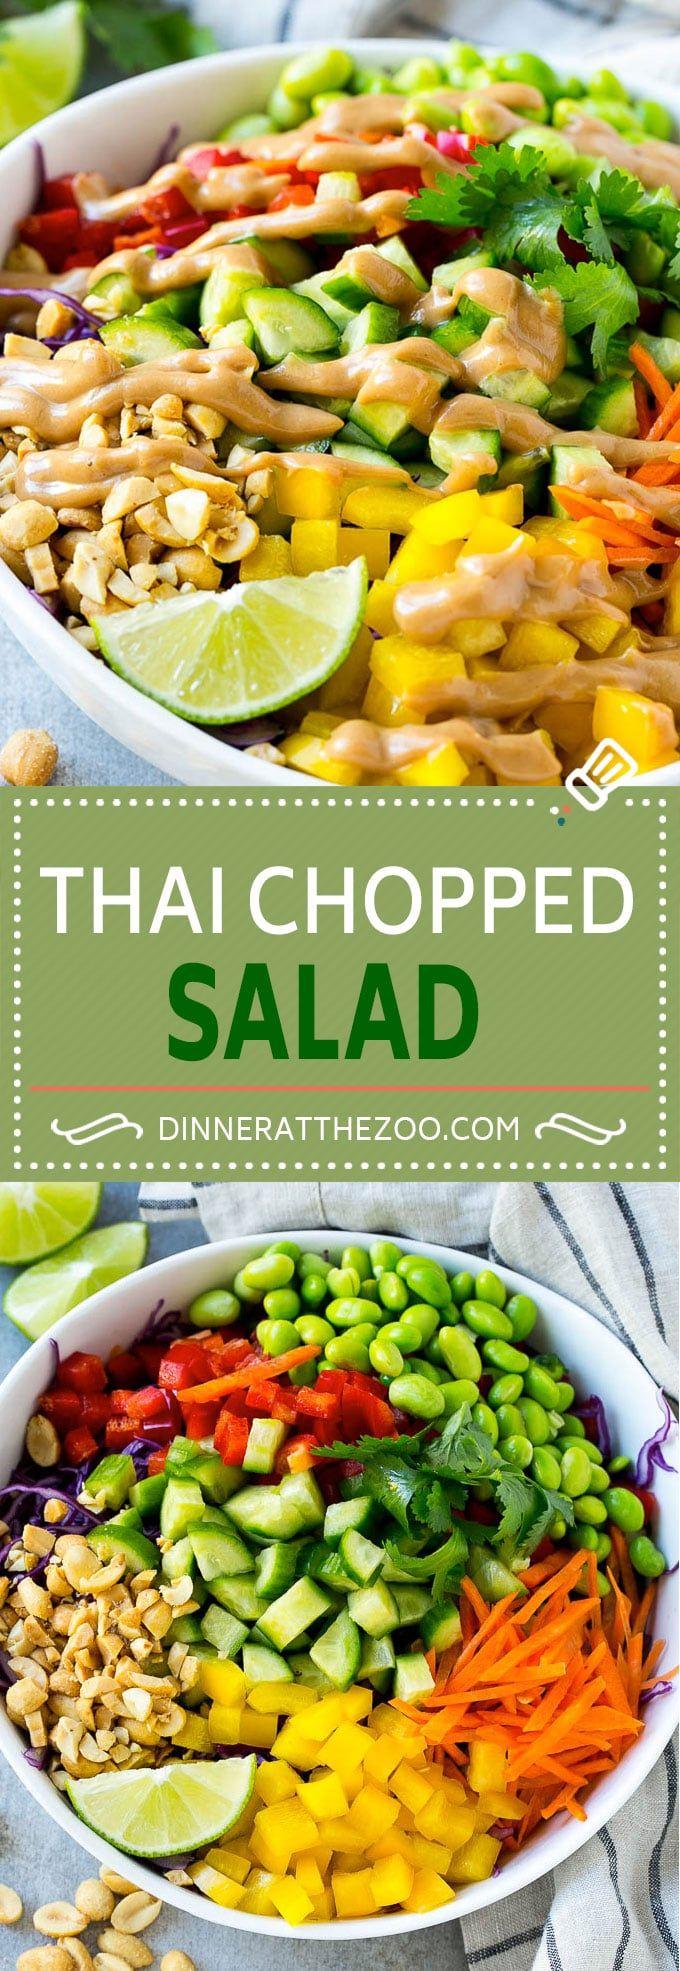 Thai Chopped Salad Recipe